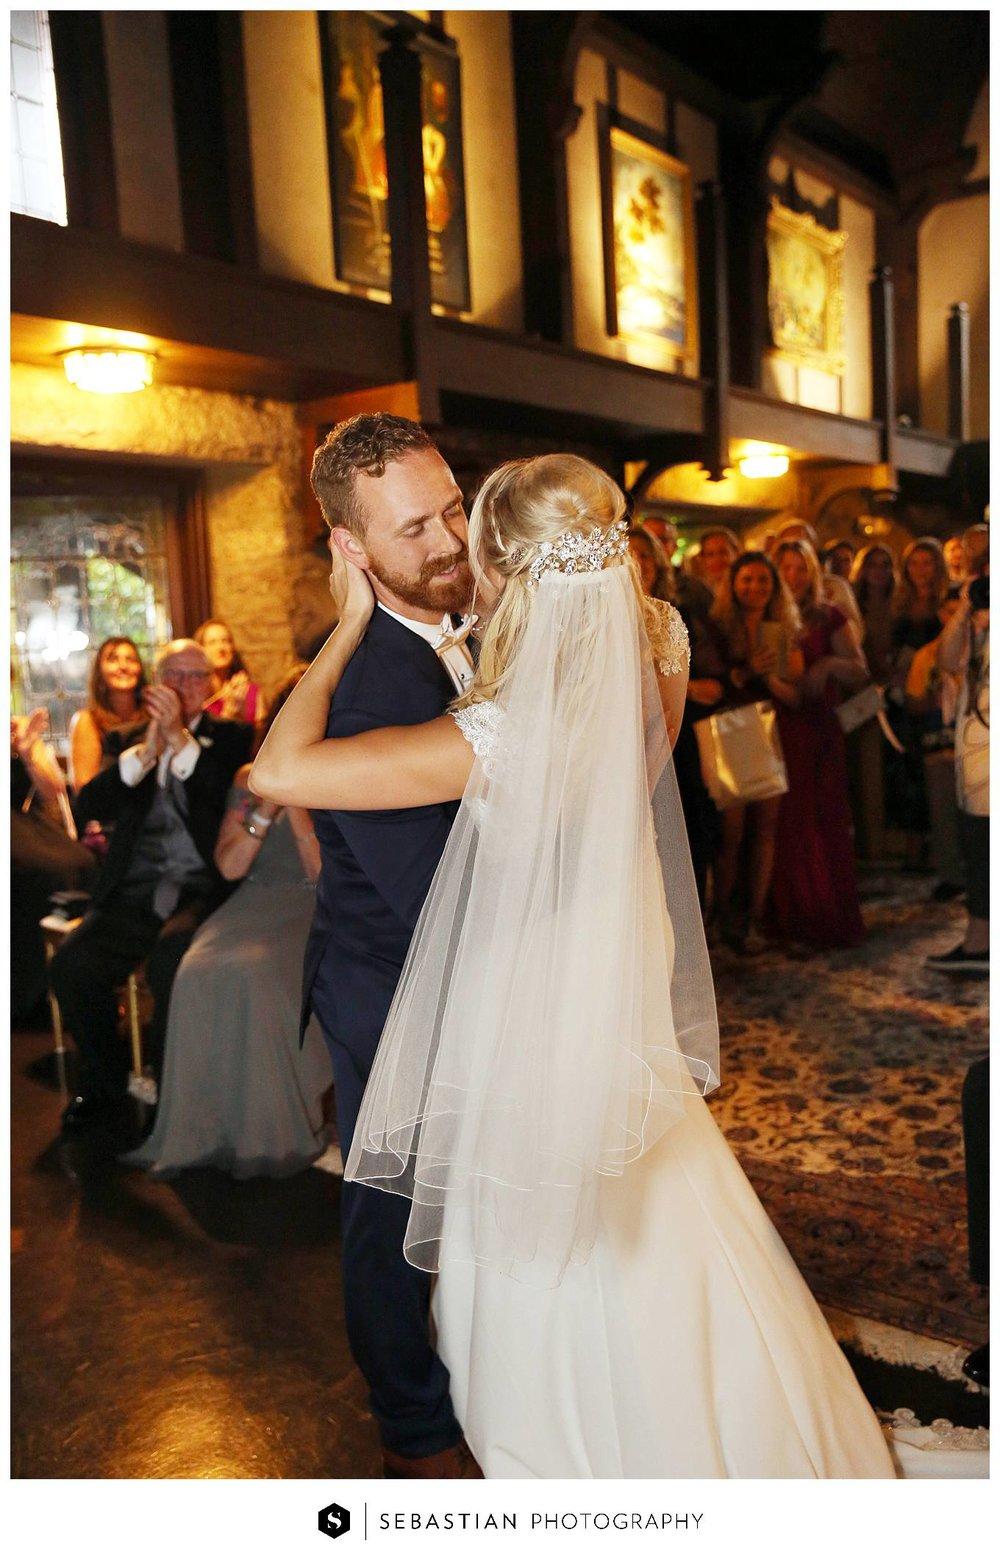 Sebastian Photography_Saint Clements Castle Wedding_CT Wedding Photographer__7059.jpg